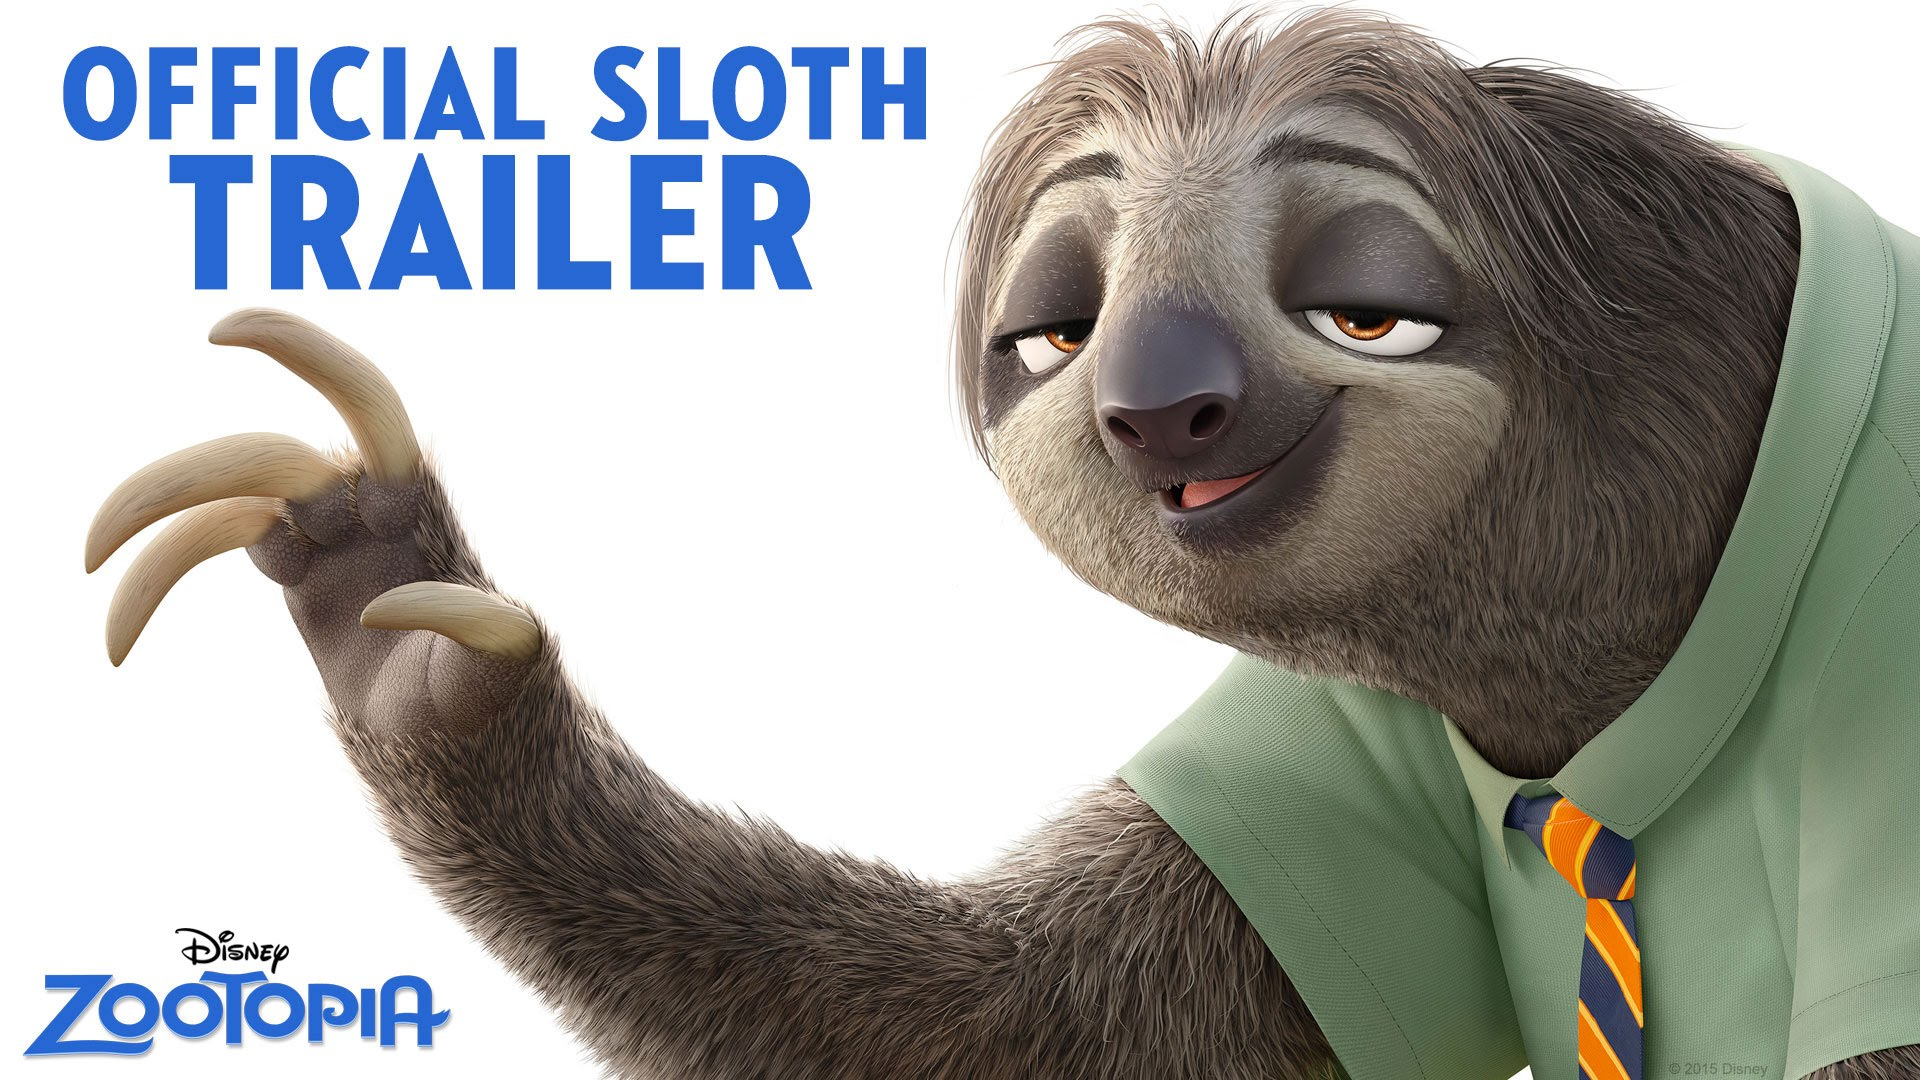 Zootopia Official Sloth Trailer